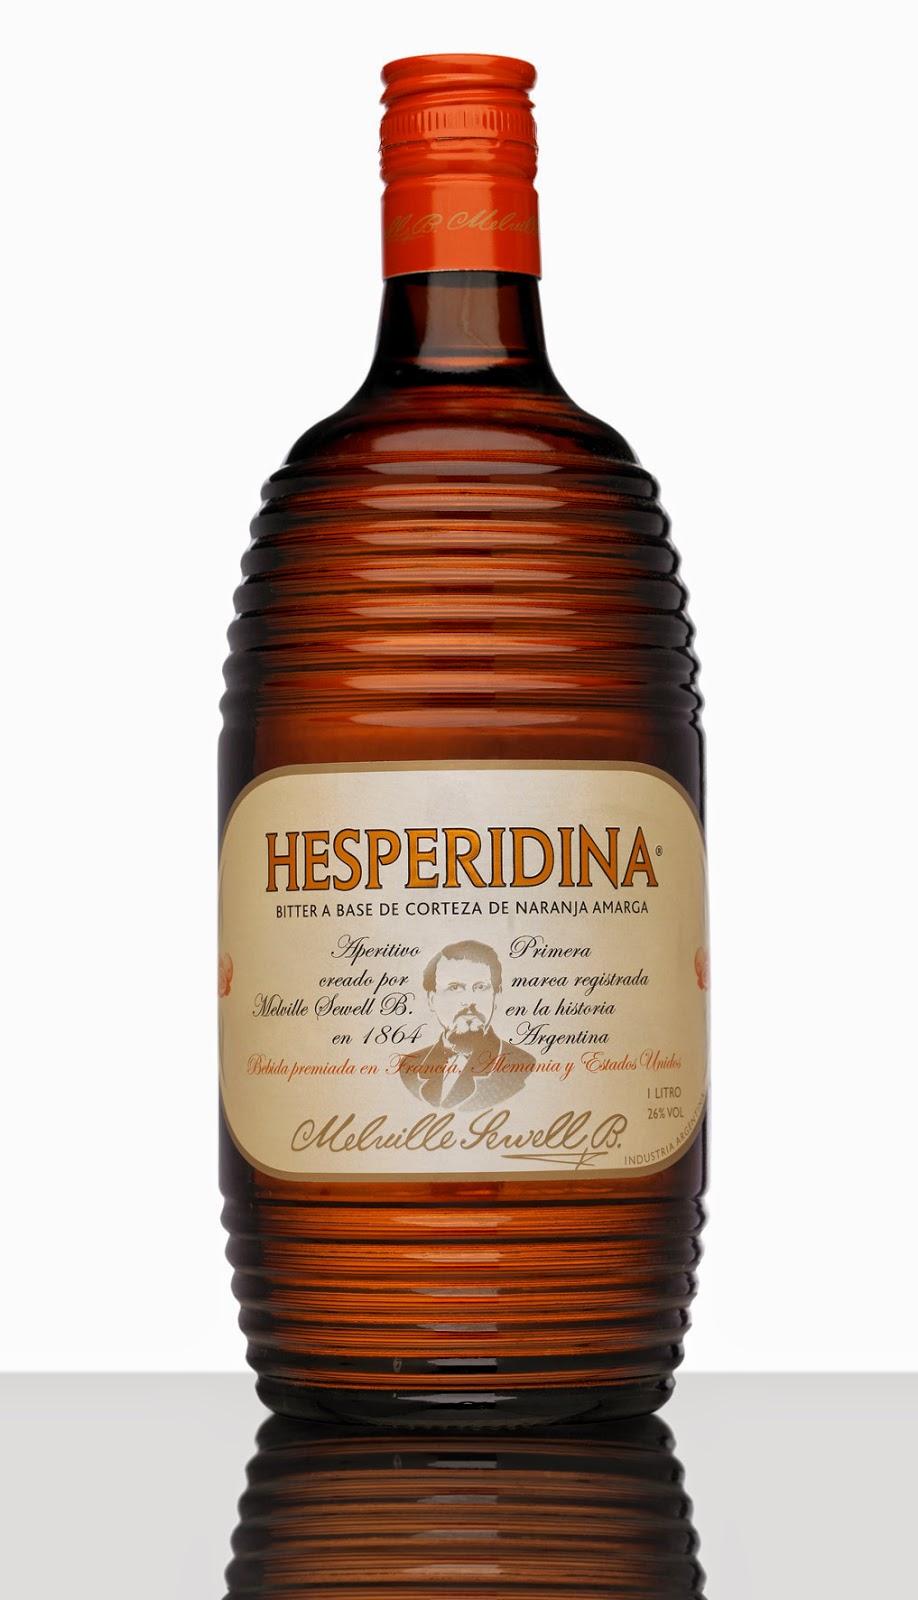 botella de hesperidina